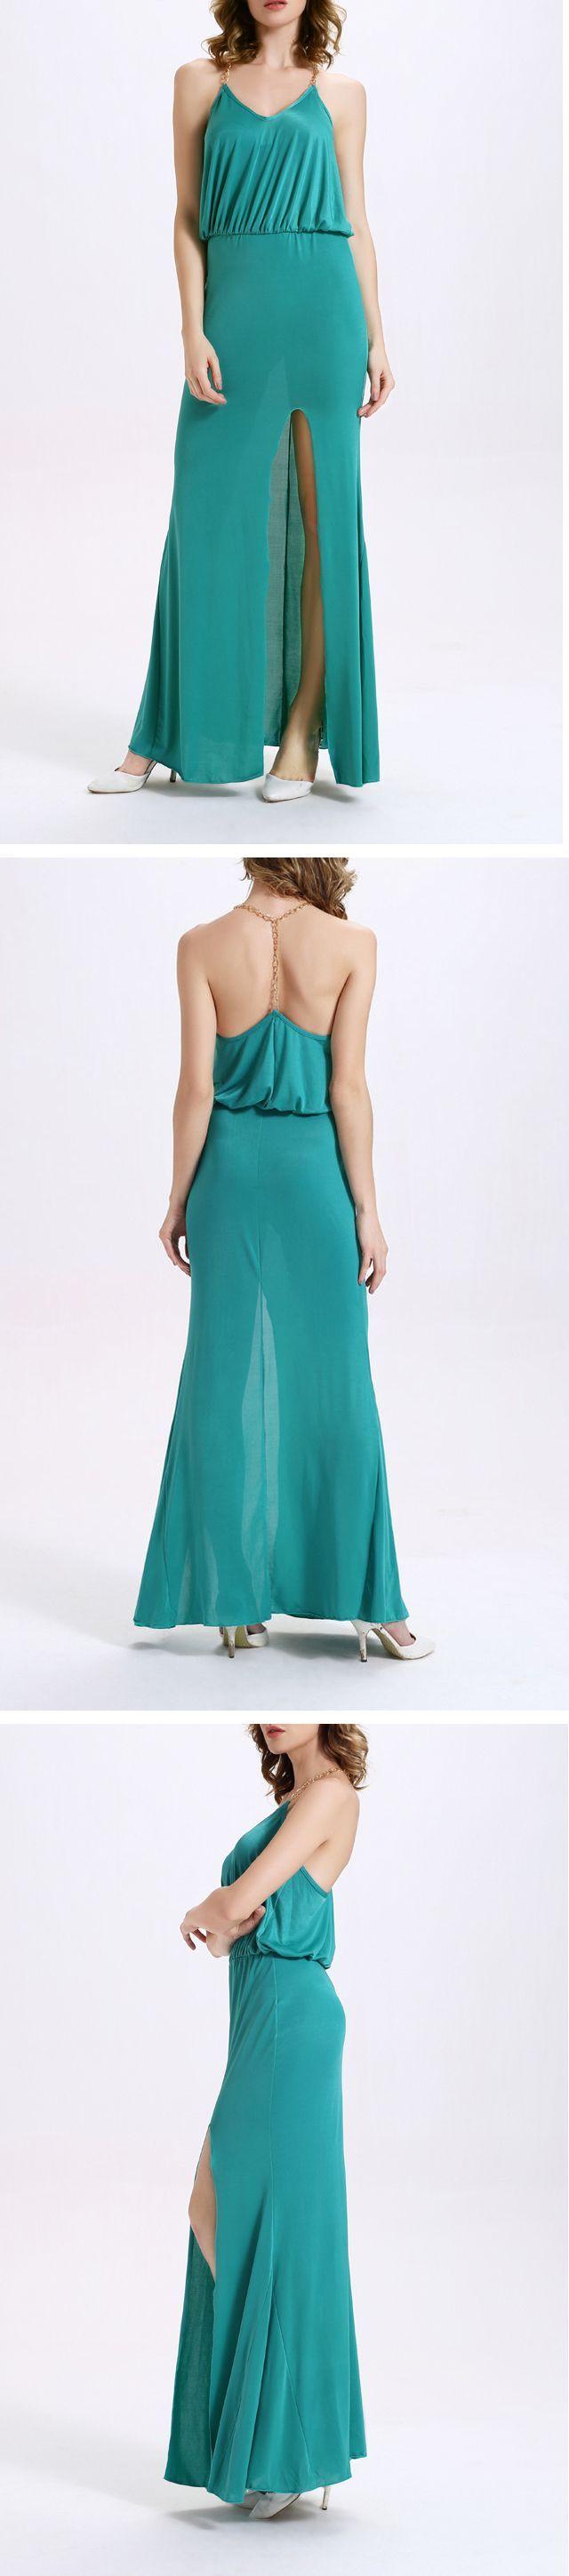 Green Knitting Trumpet Dress